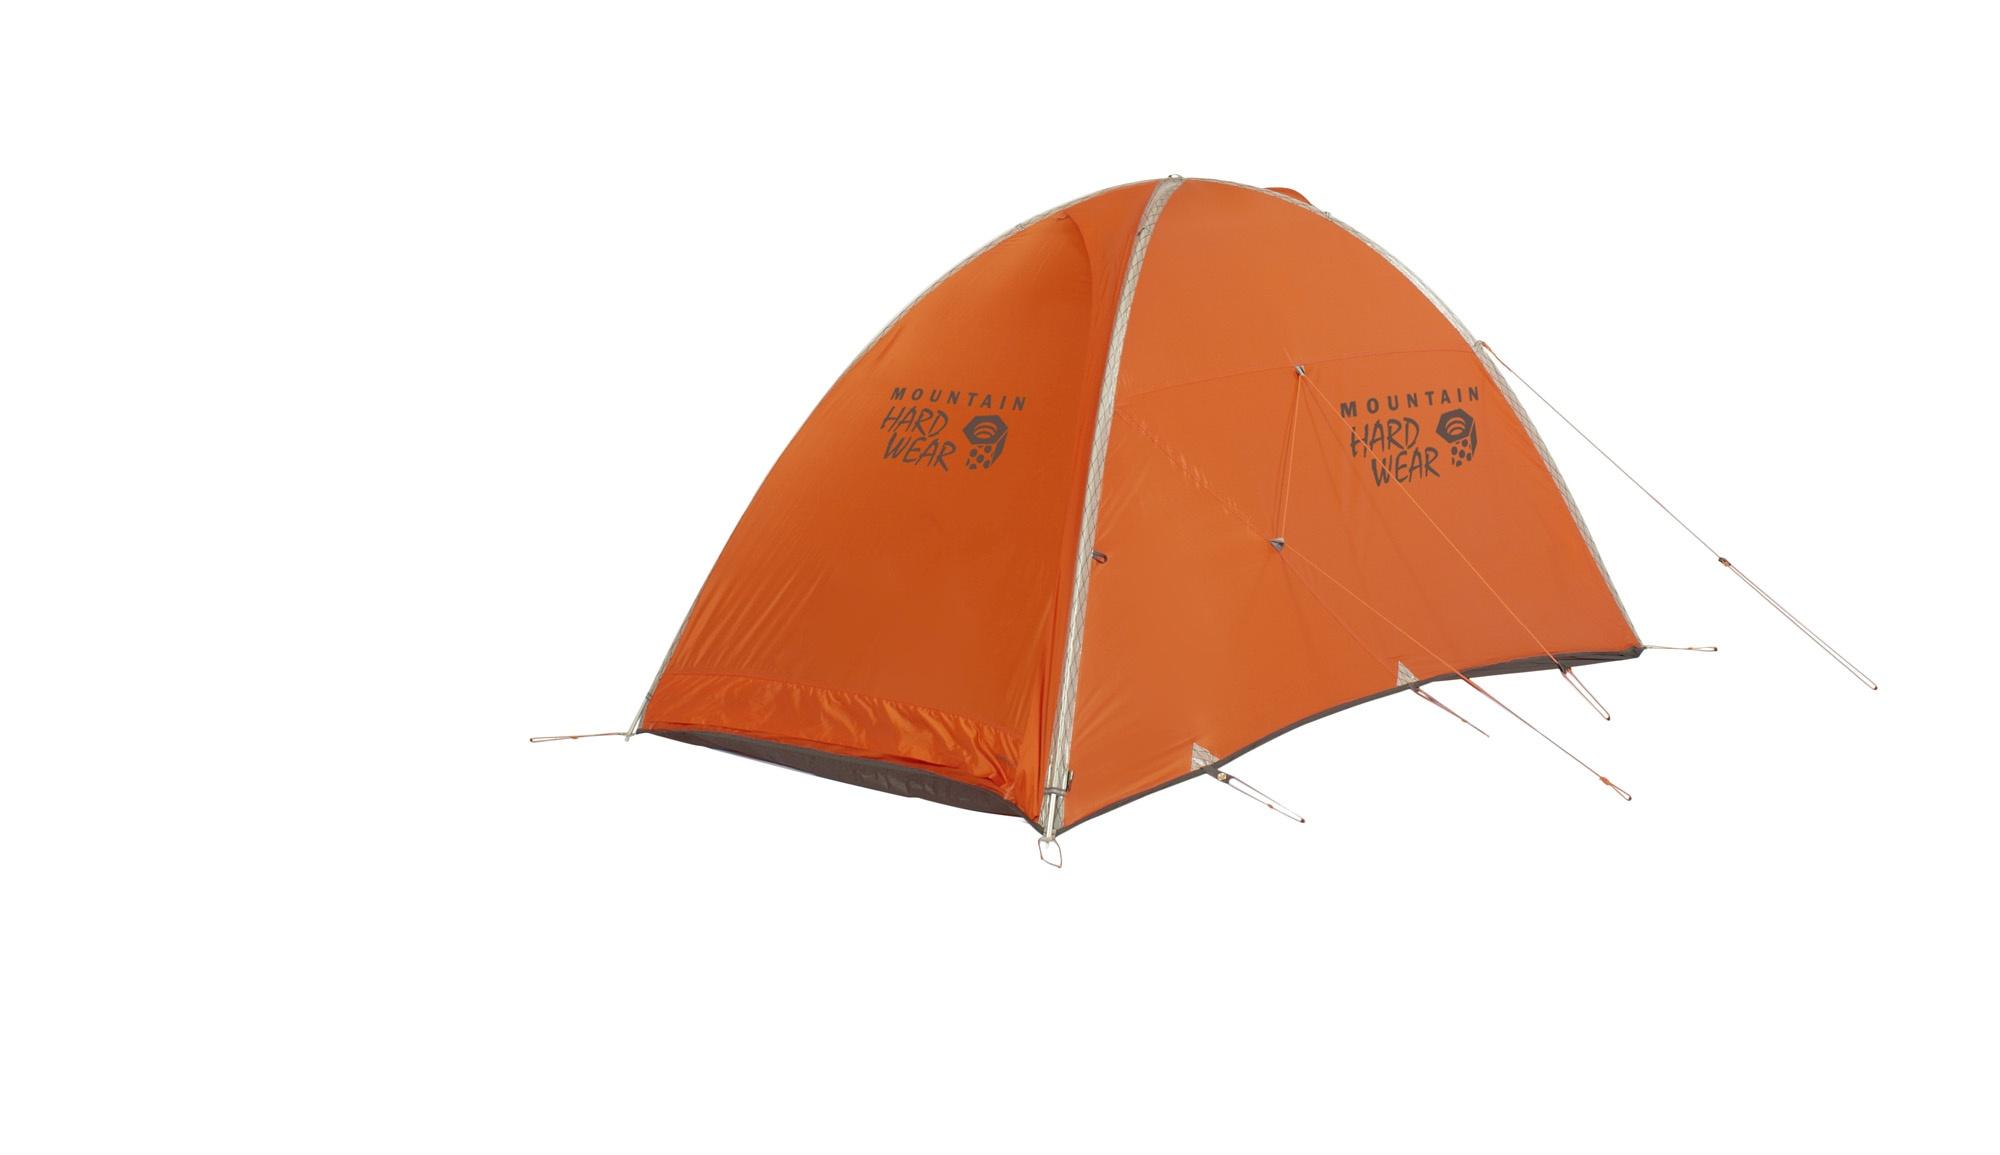 Mountain Hardwear Direkt2 State Orange-30